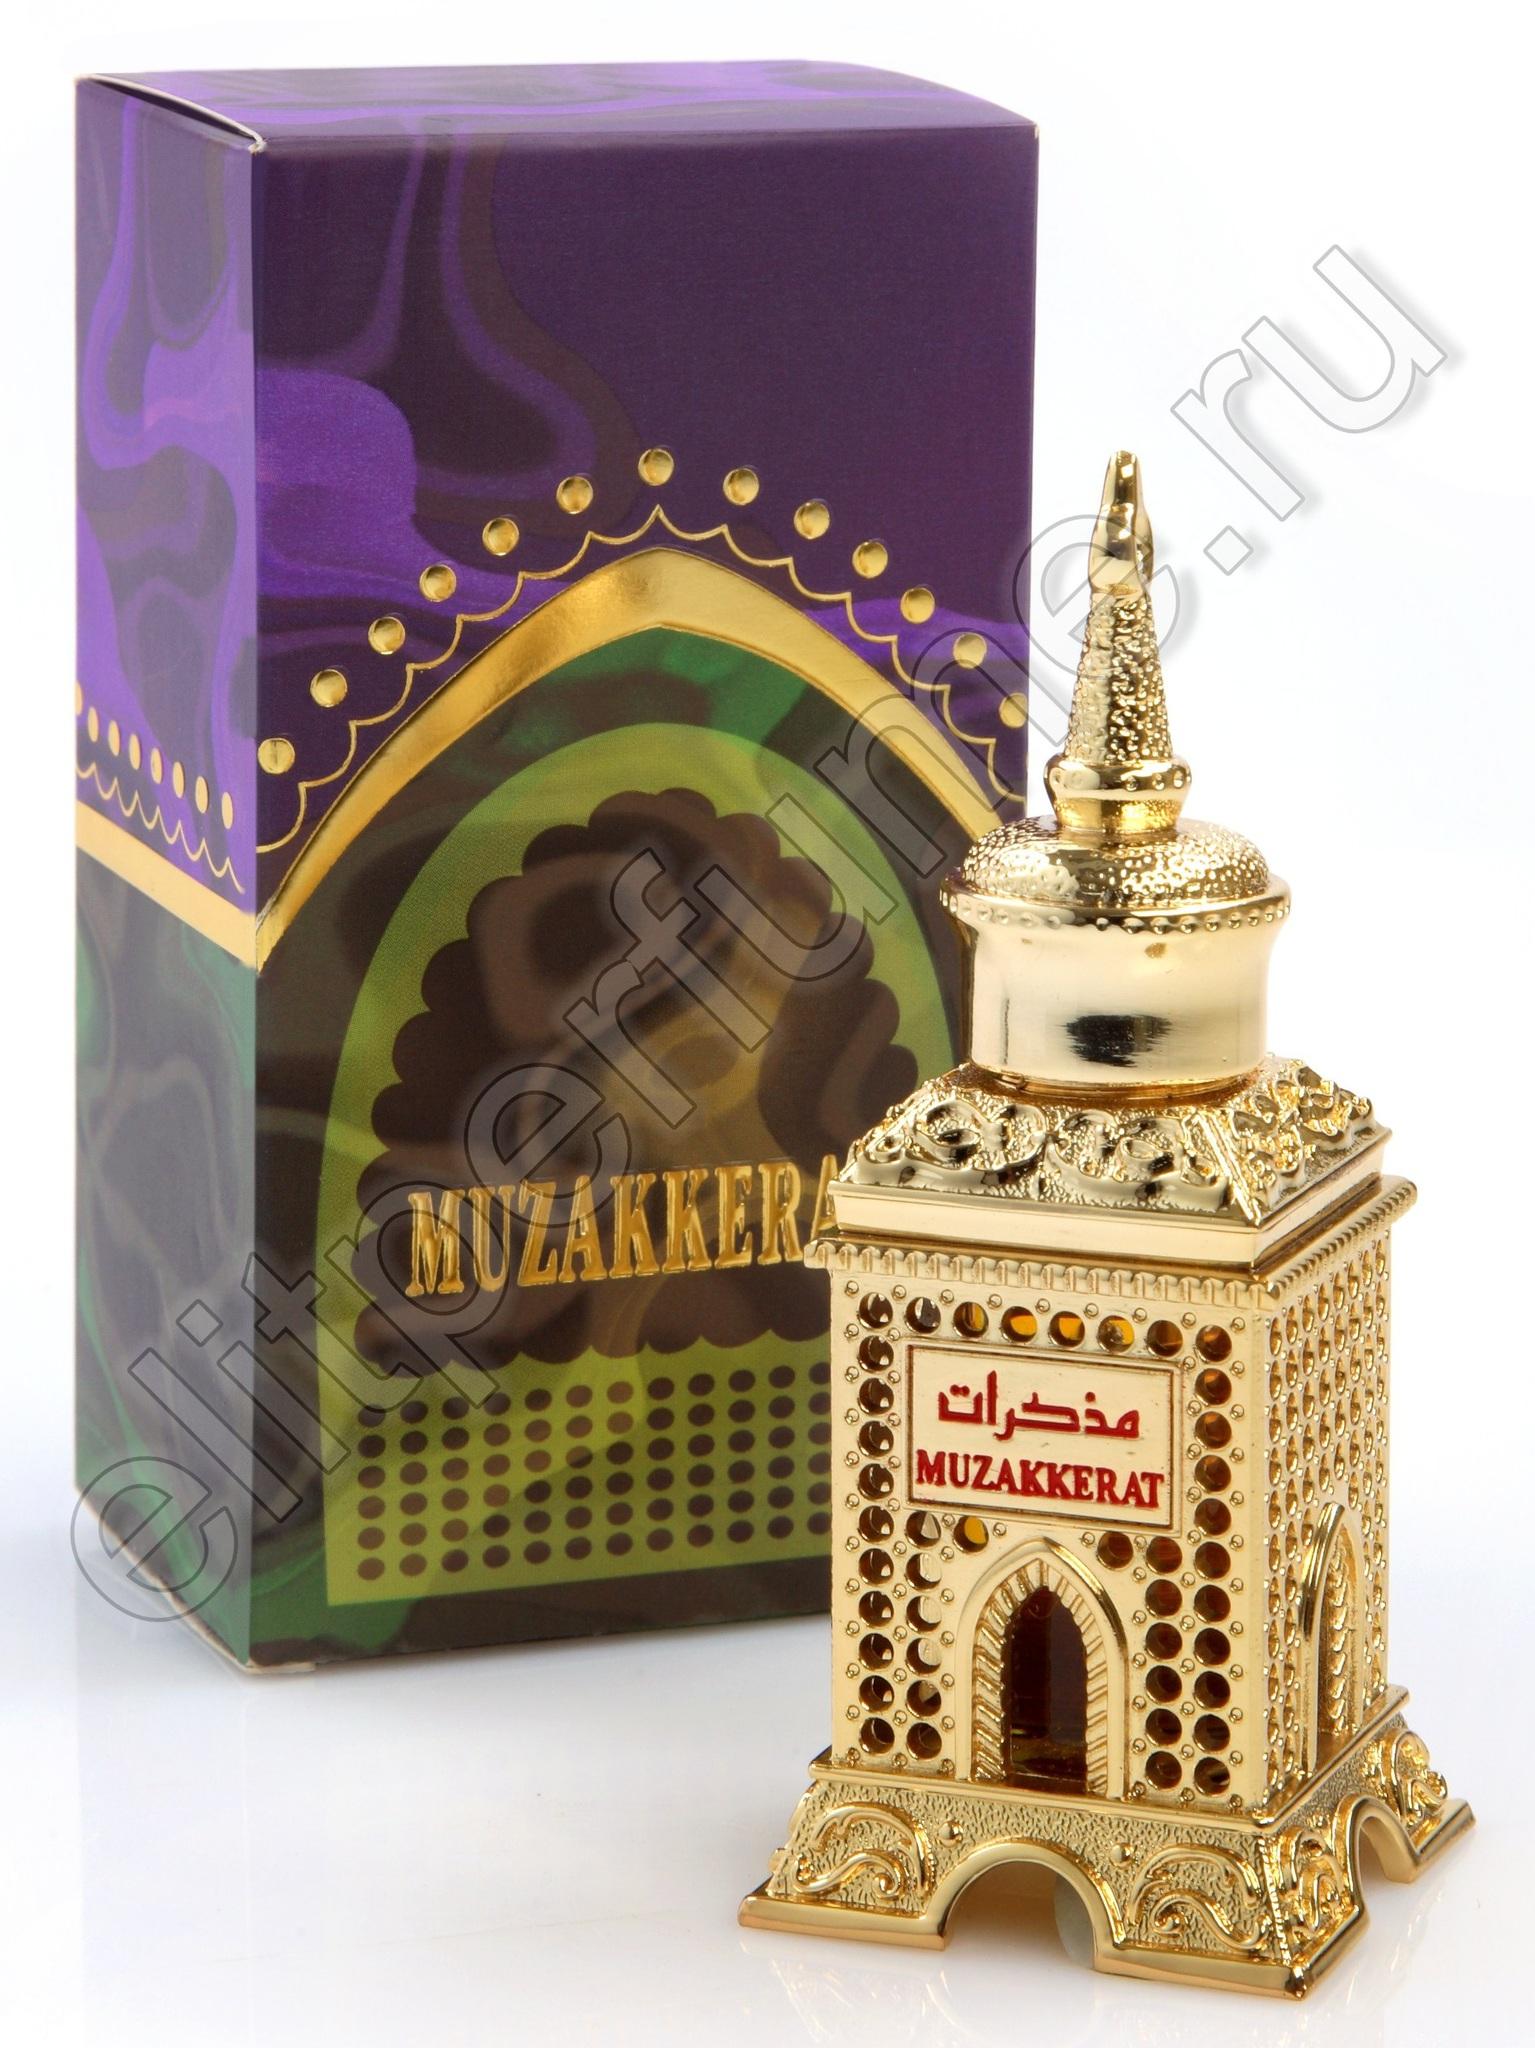 Музакерат Muzakkerat 12 мл арабские масляные духи от Аль Харамайн Al Haramain Perfumes